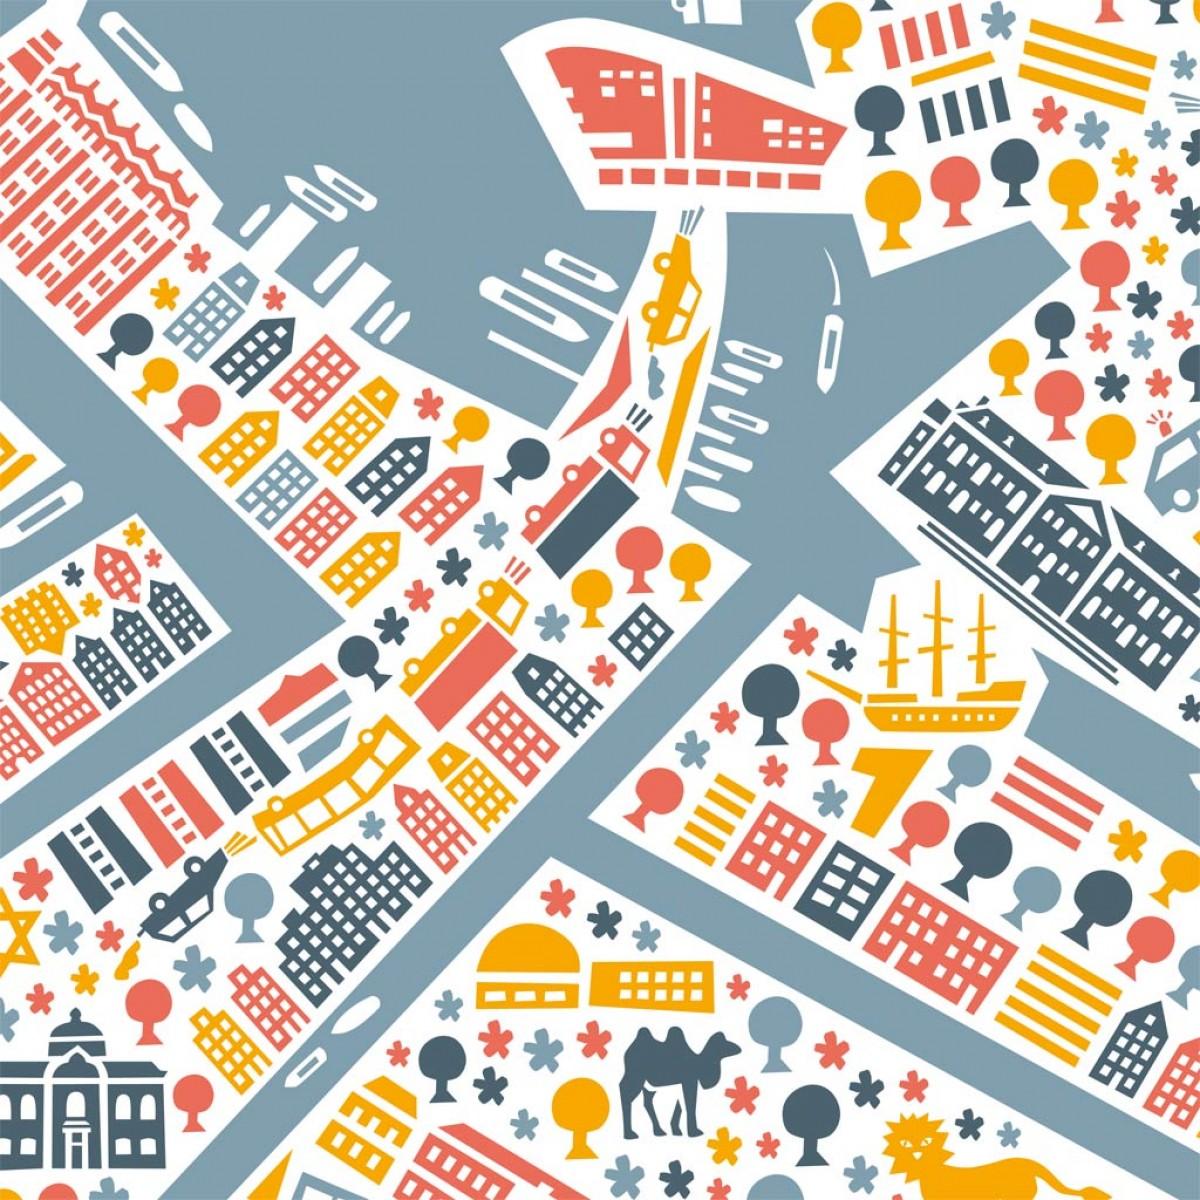 Vianina Amsterdam Poster 100x70